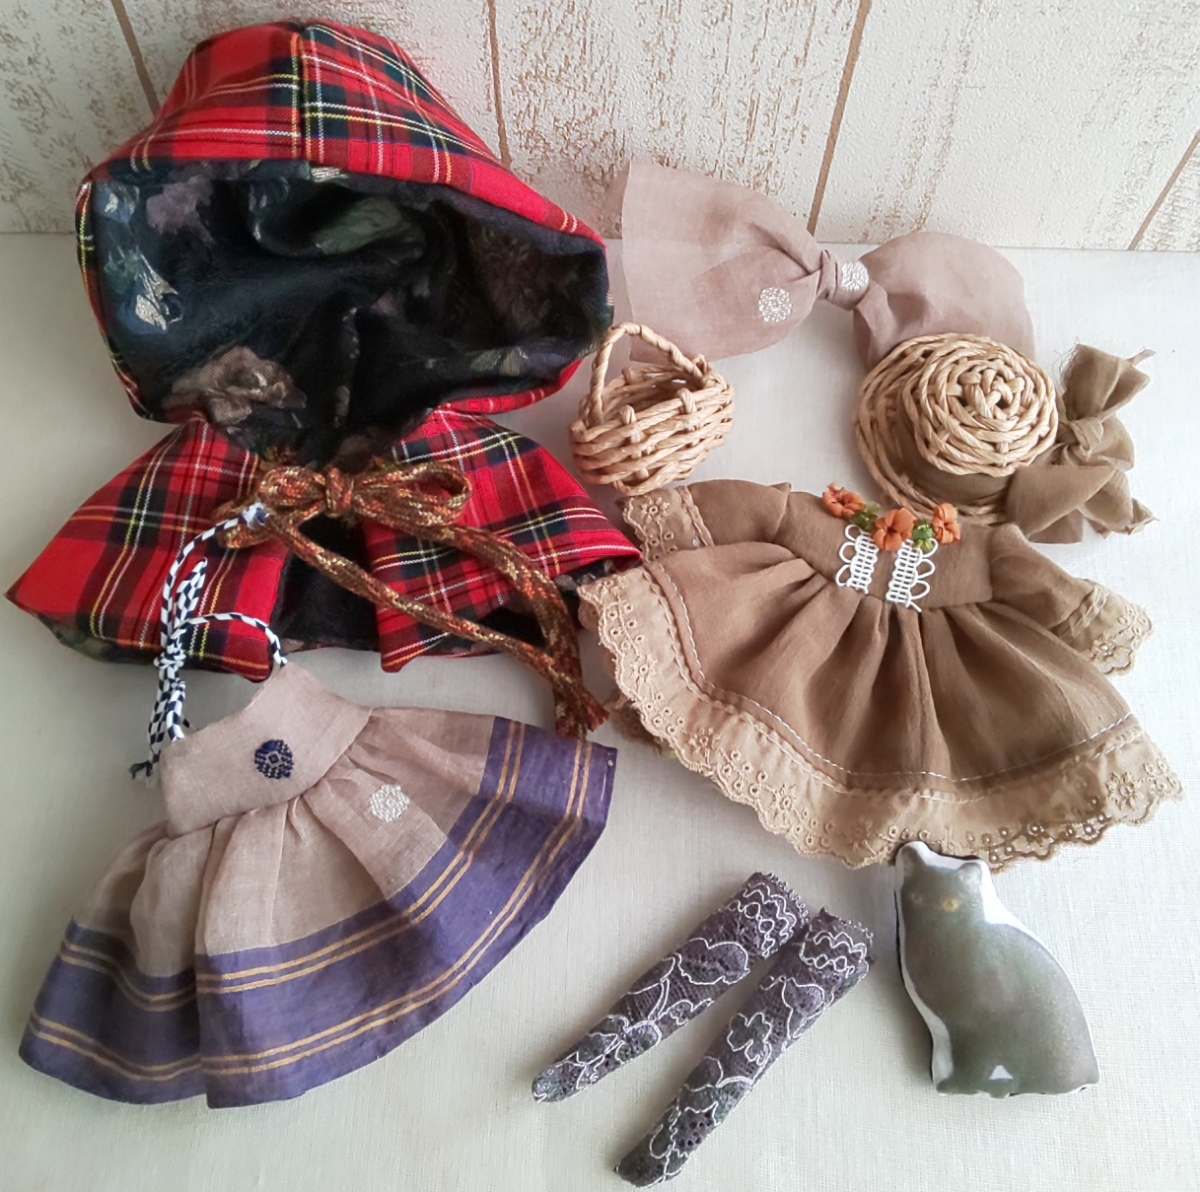 oeuf ☆ネオブライス★頭巾セット_画像3